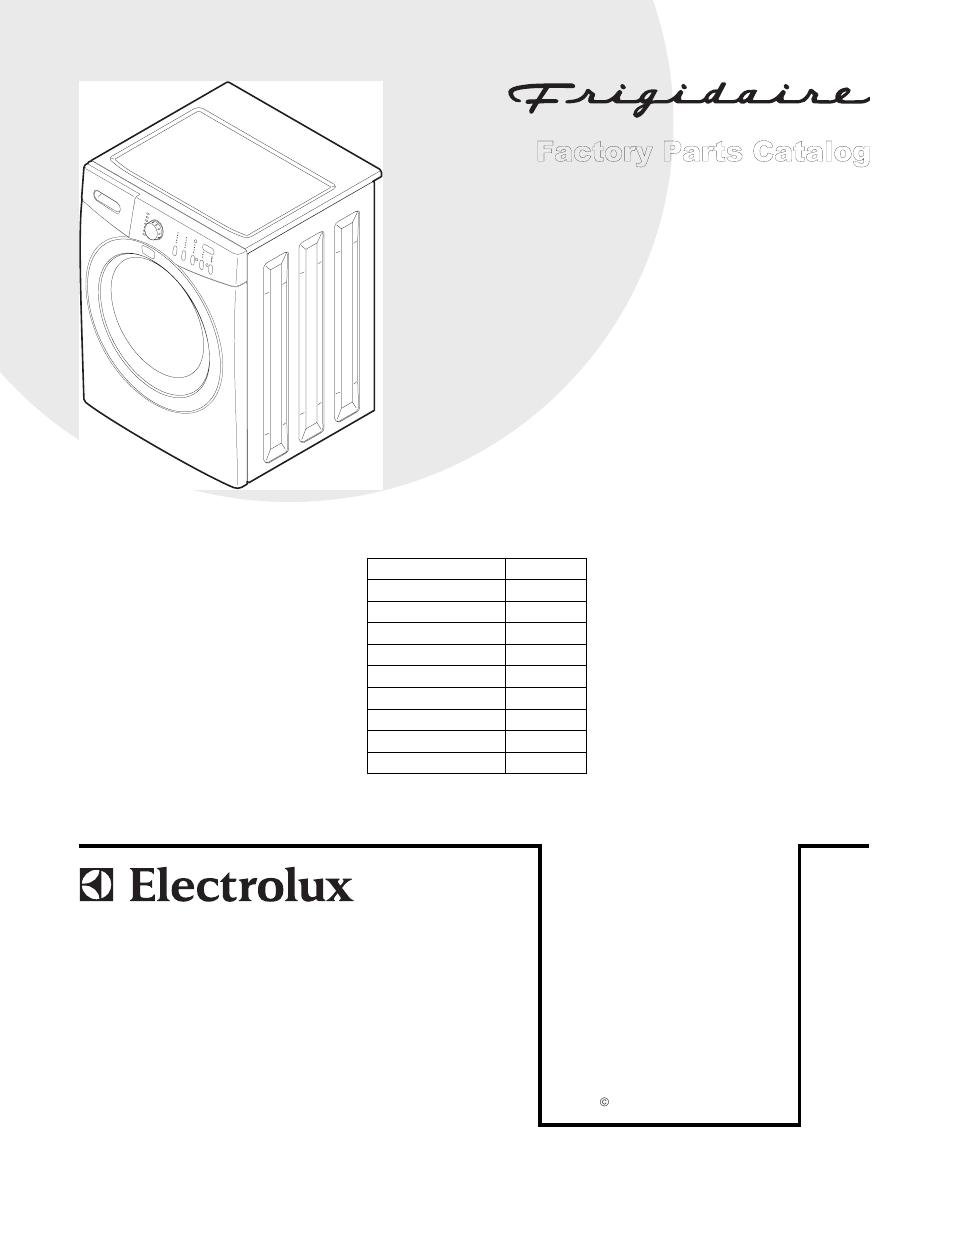 medium resolution of  frigidaire ltf6000es0 page1 frigidaire ltf6000es0 user manual 8 pages at cita asia ltf6000es0 wire diagram 15 frigidaire washer